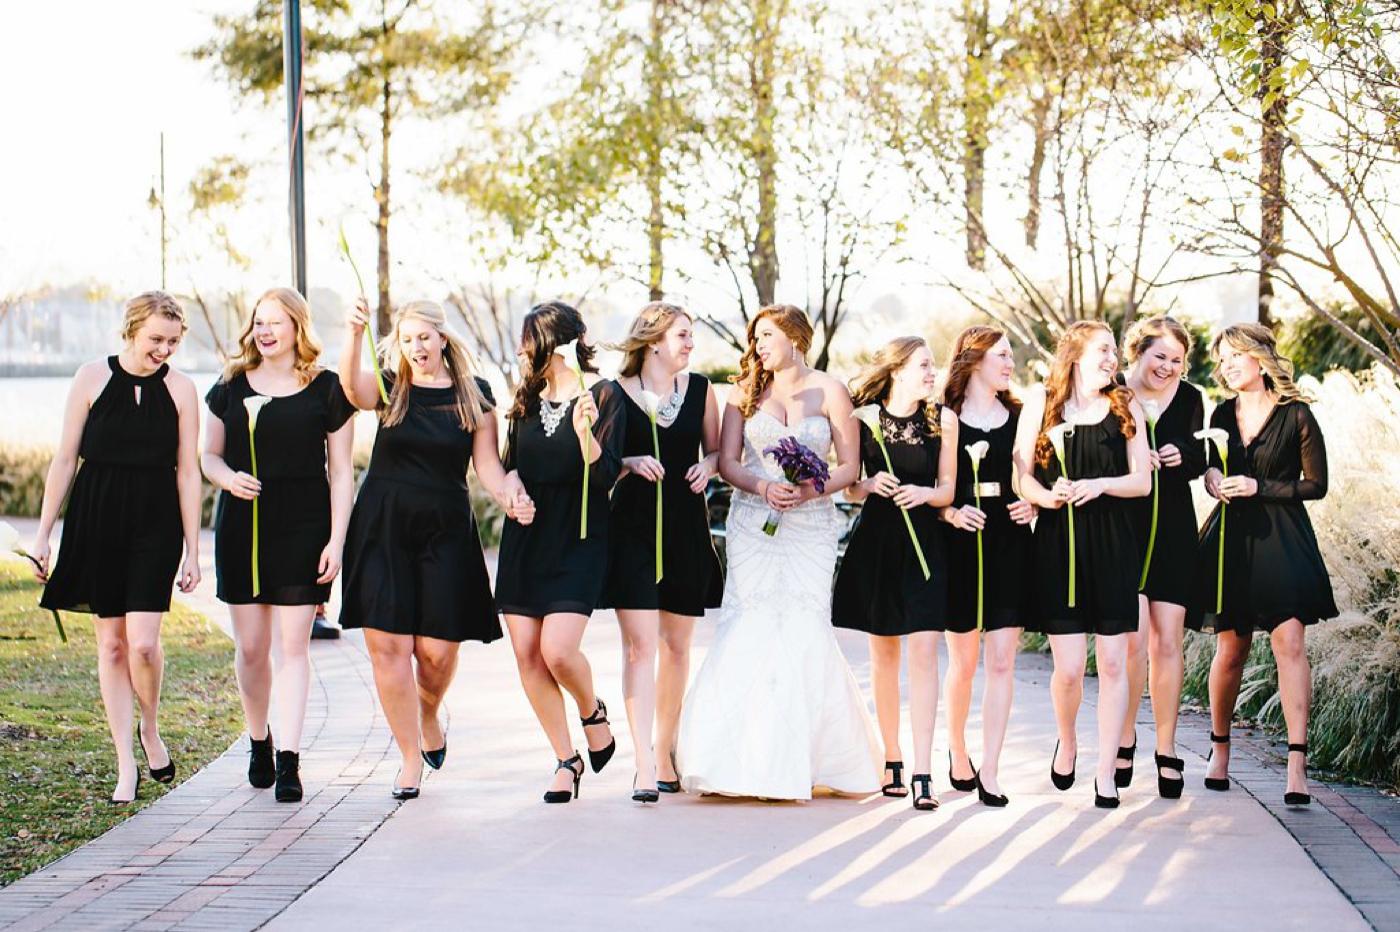 chicago-fine-art-wedding-photography-burnette14